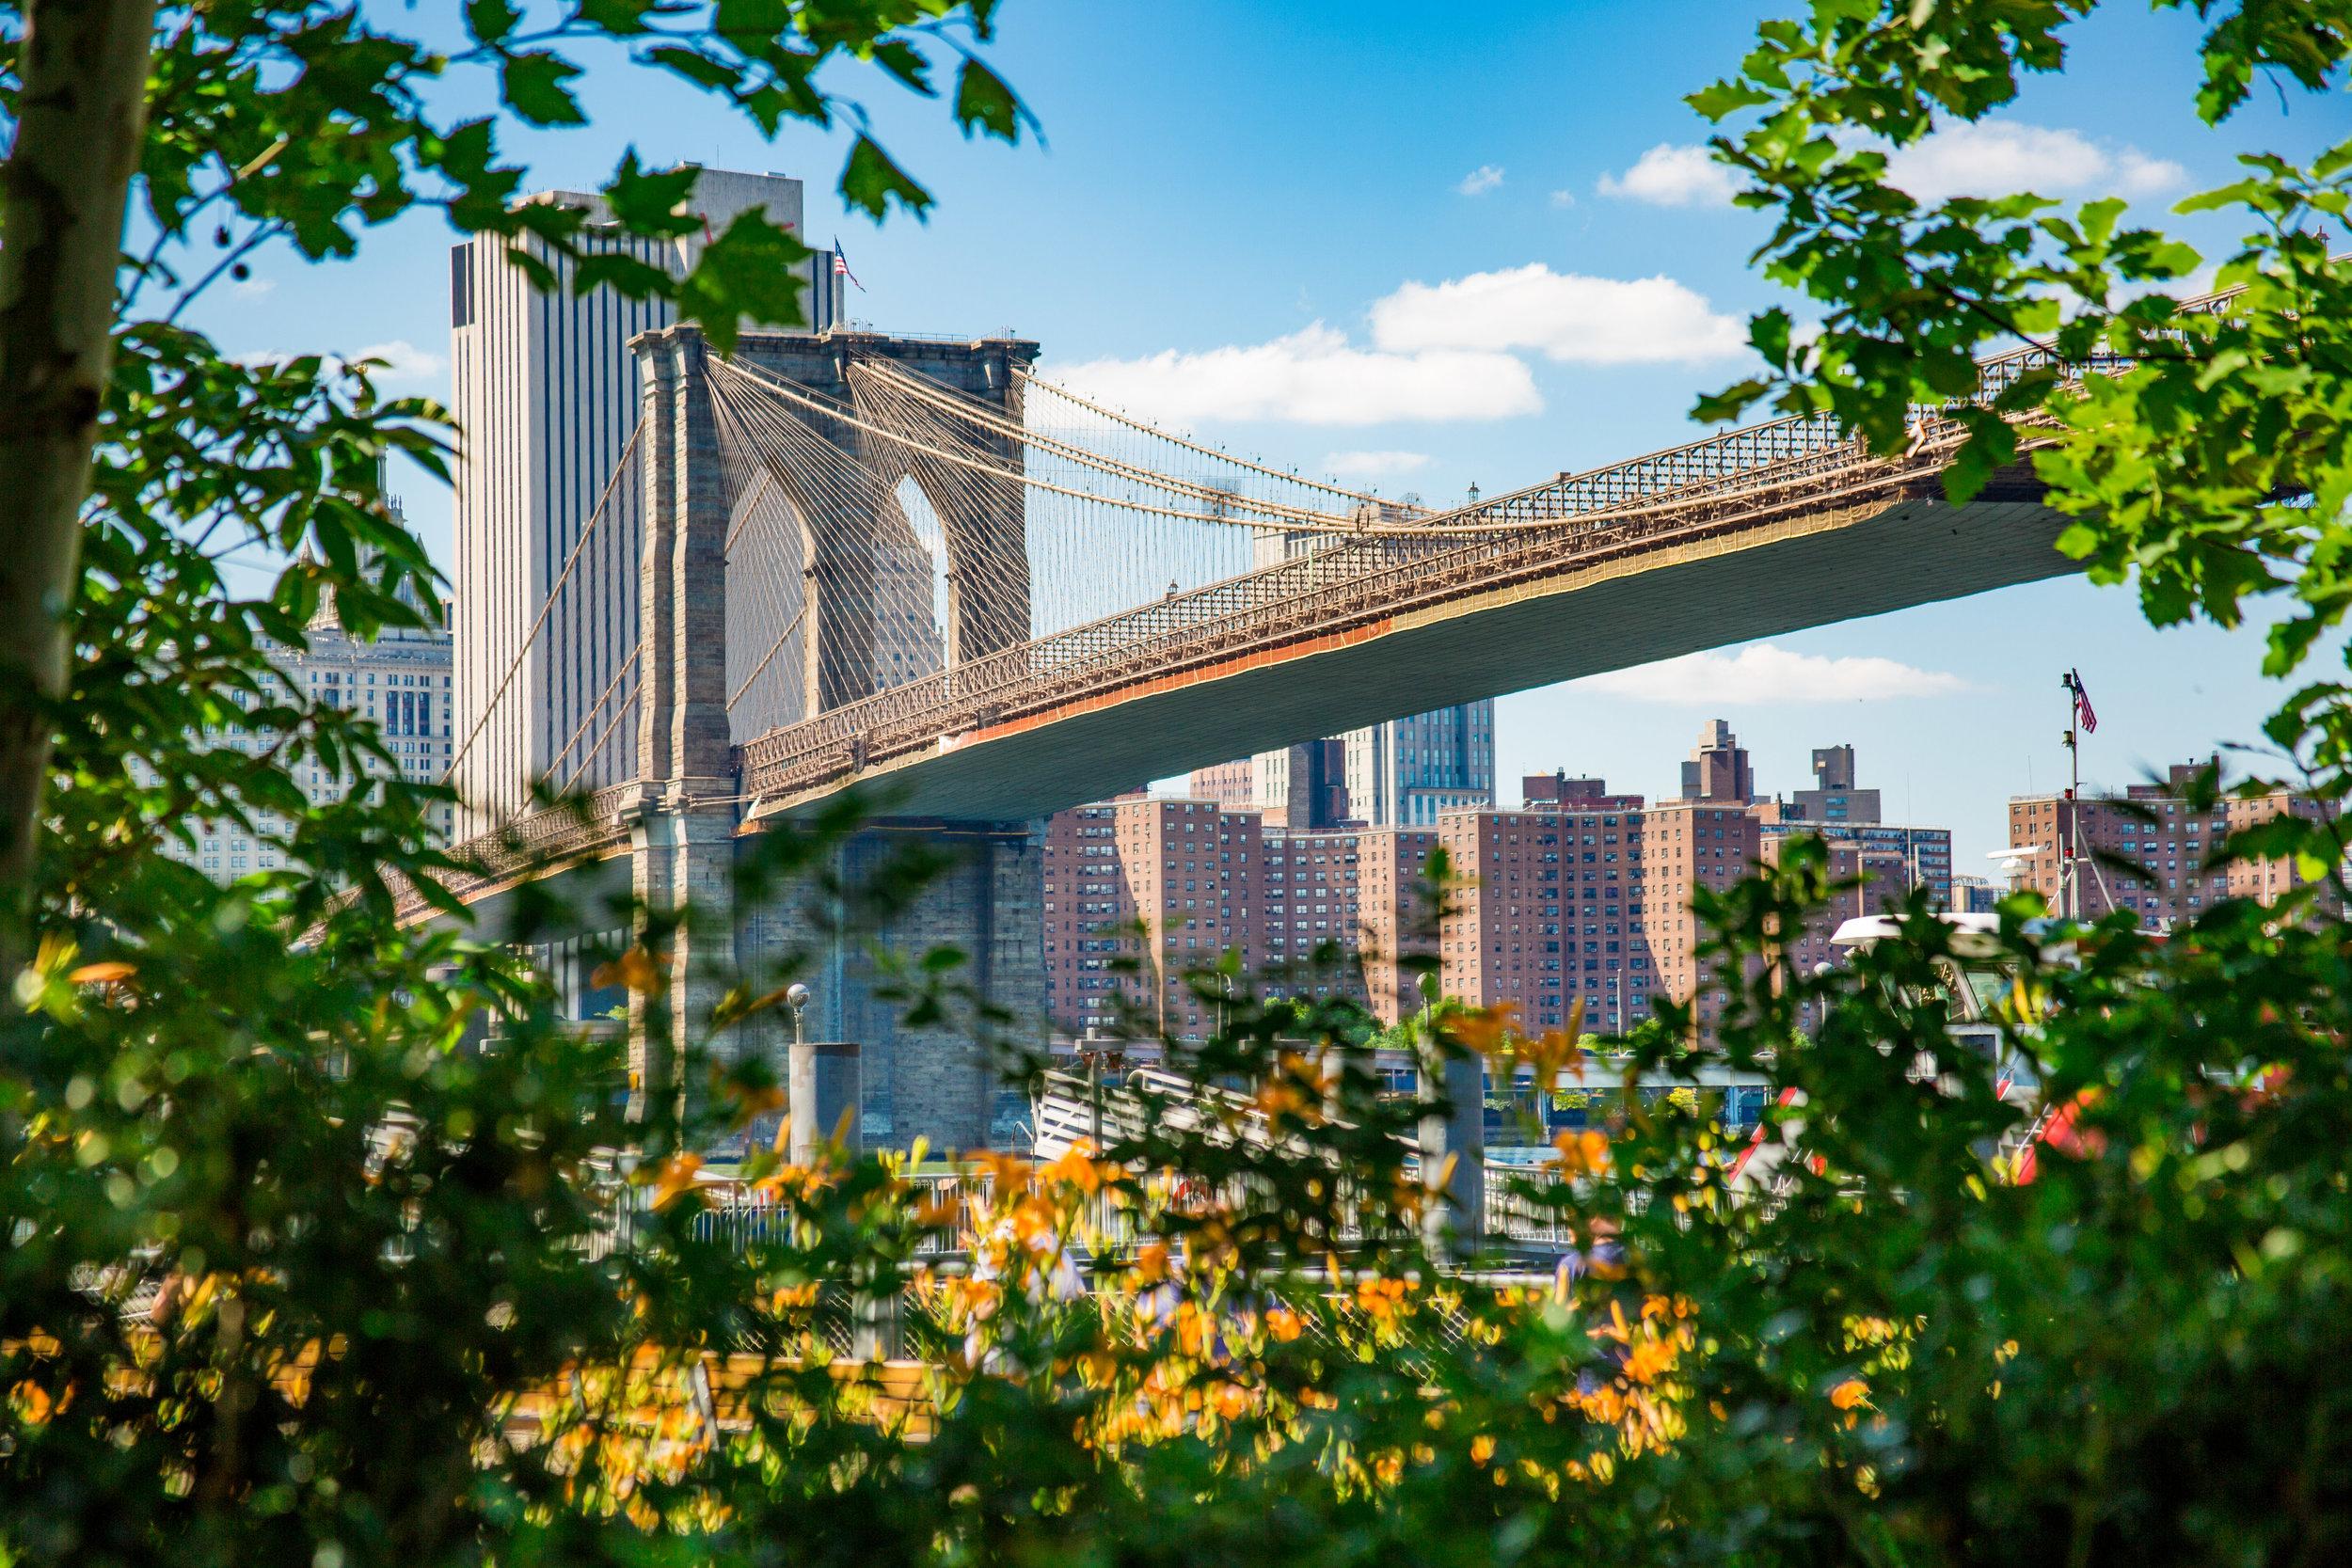 LSNY_Brooklyn_Bridge_Park-62.jpg